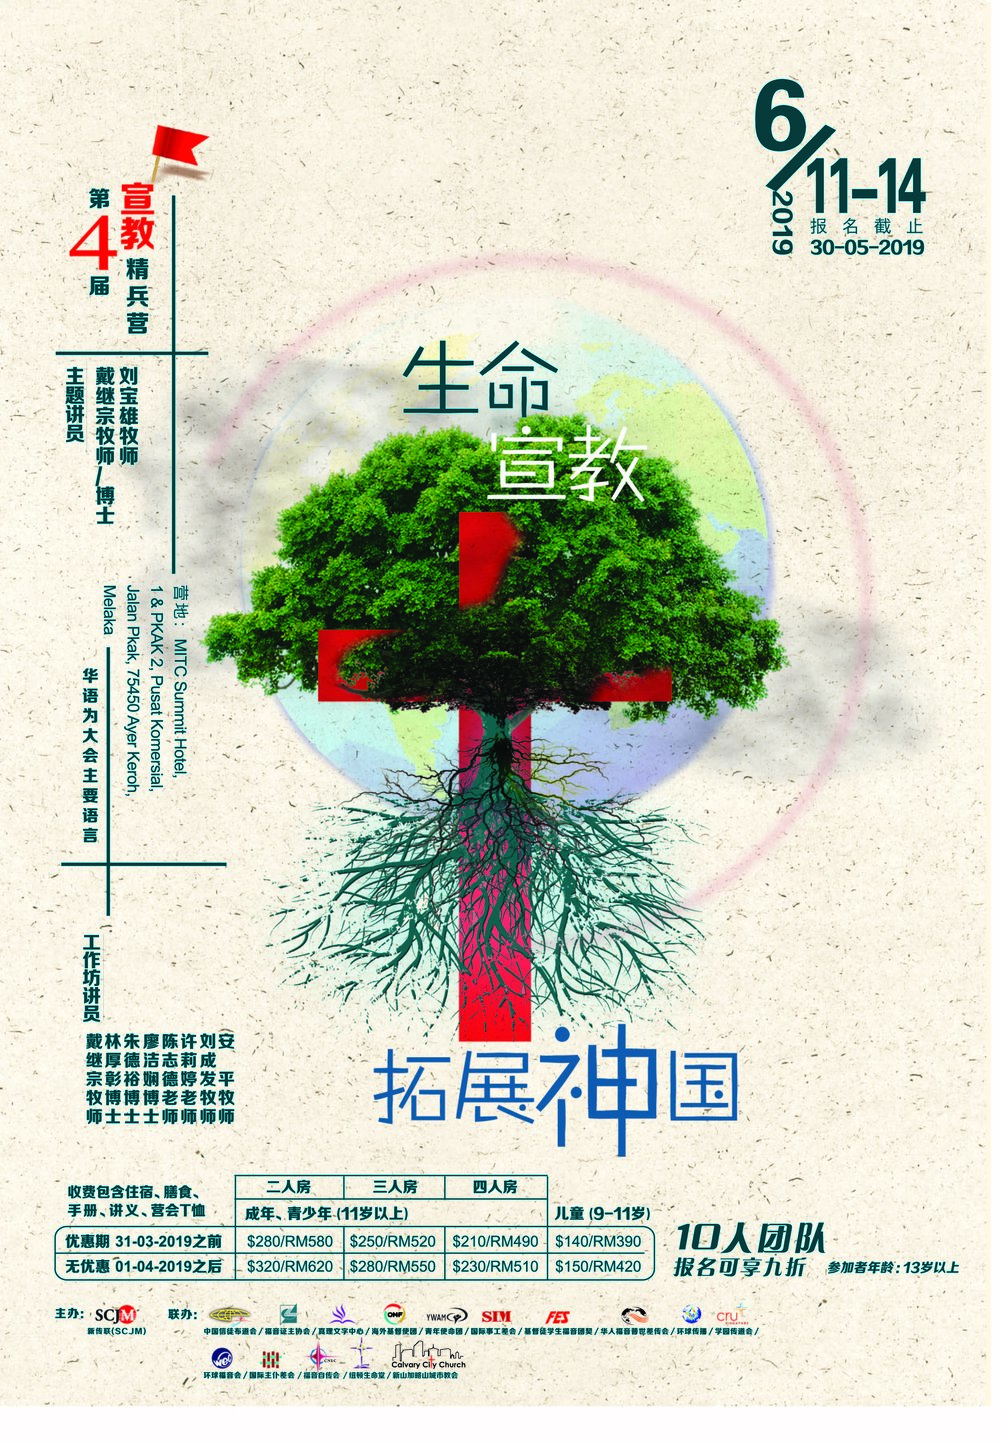 4th宣教精兵营2019-Poster v3.jpg